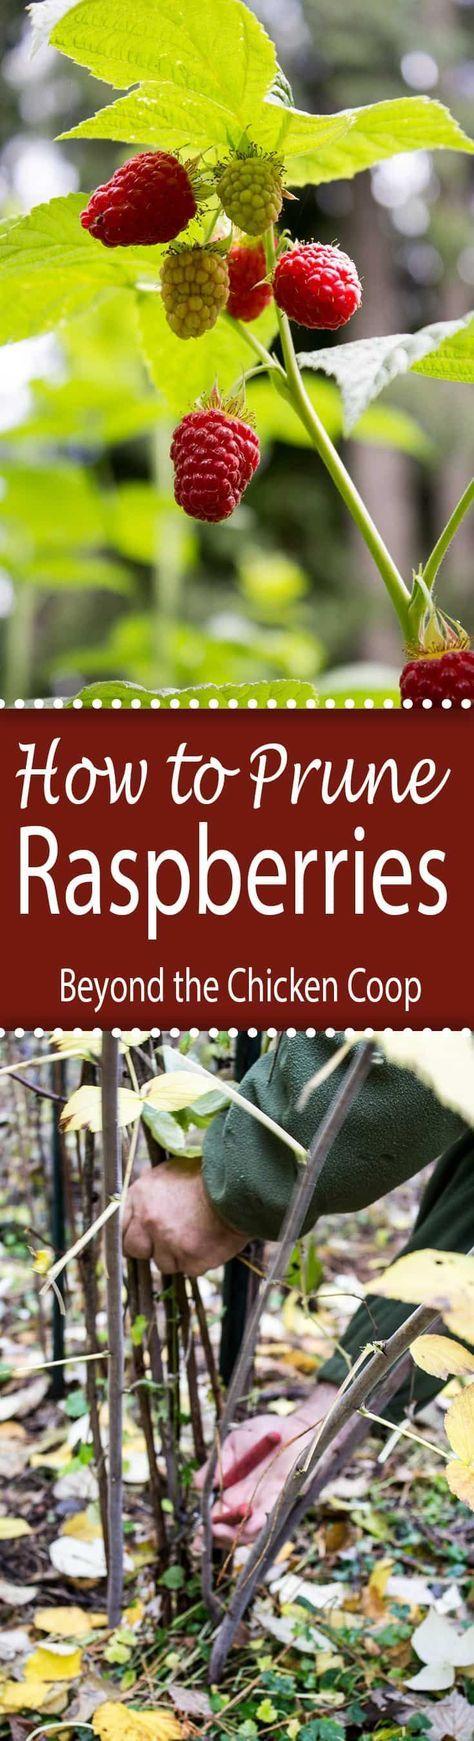 Pin By Teresa Jessup On Gardening Pruning Raspberries Raspberry Plants Organic Gardening Tips